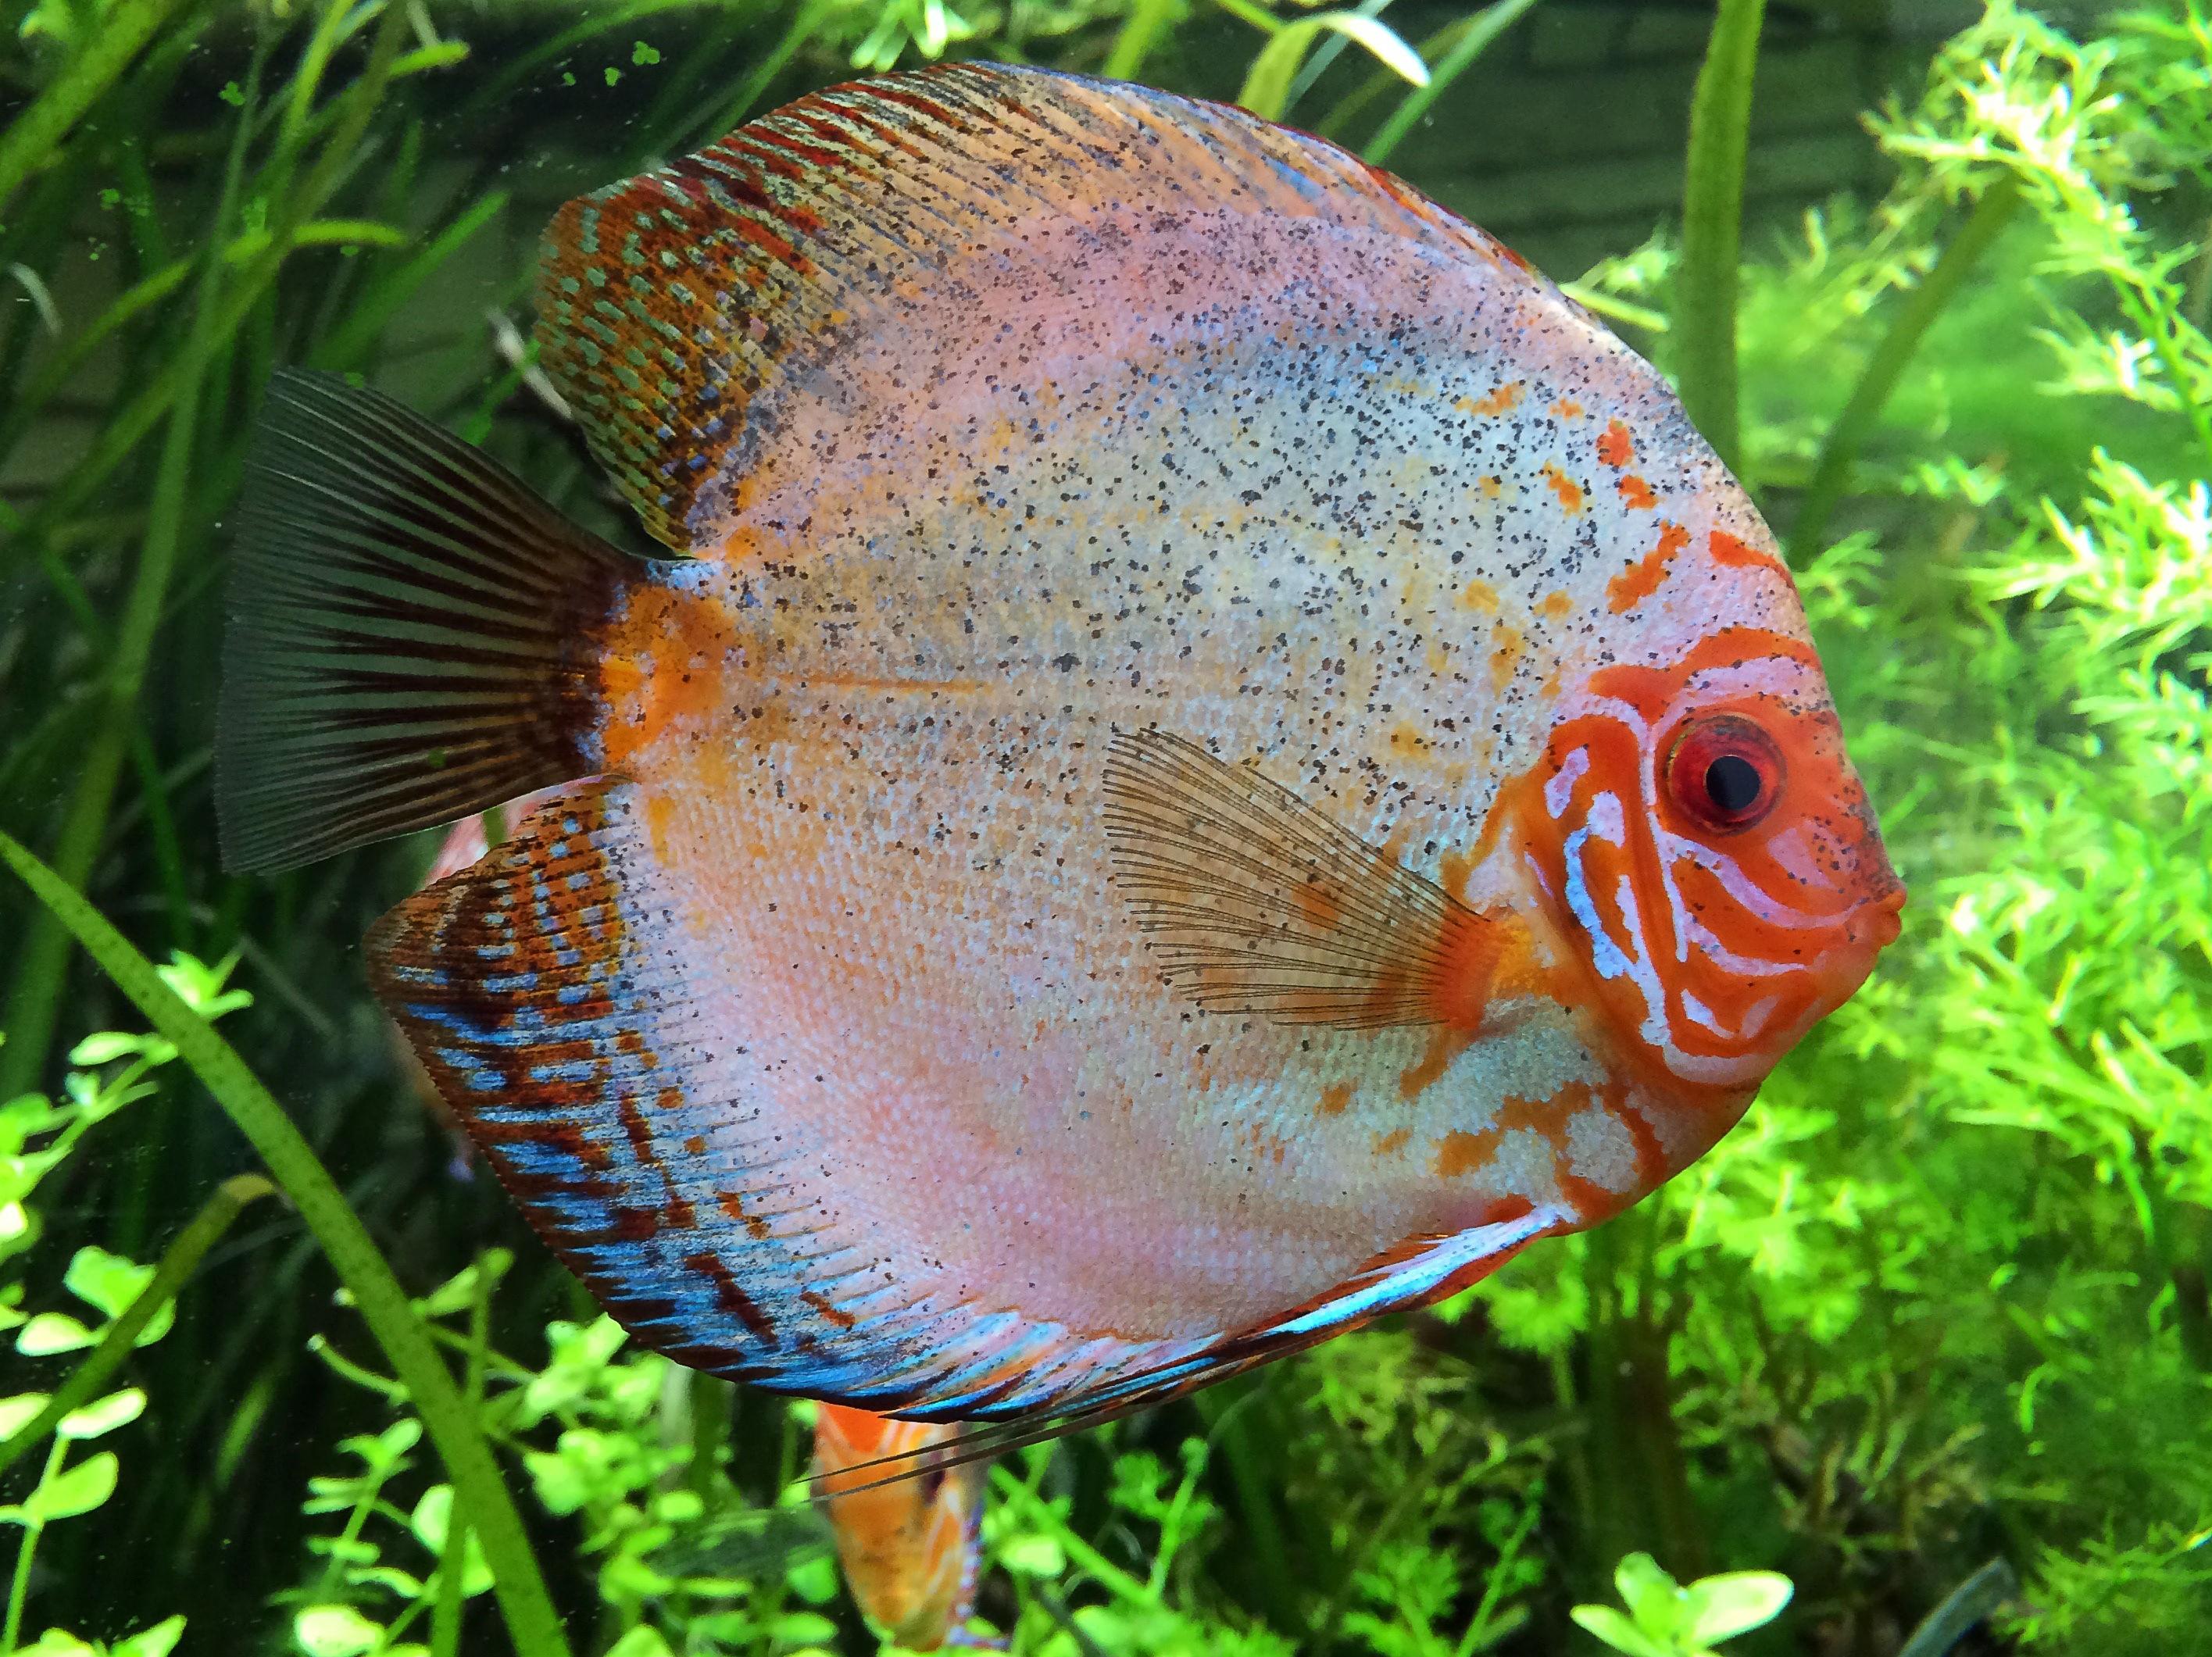 77827 Screensavers and Wallpapers Aquarium for phone. Download Animals, Aquarium, Fish, Cichlid, Cichlids pictures for free